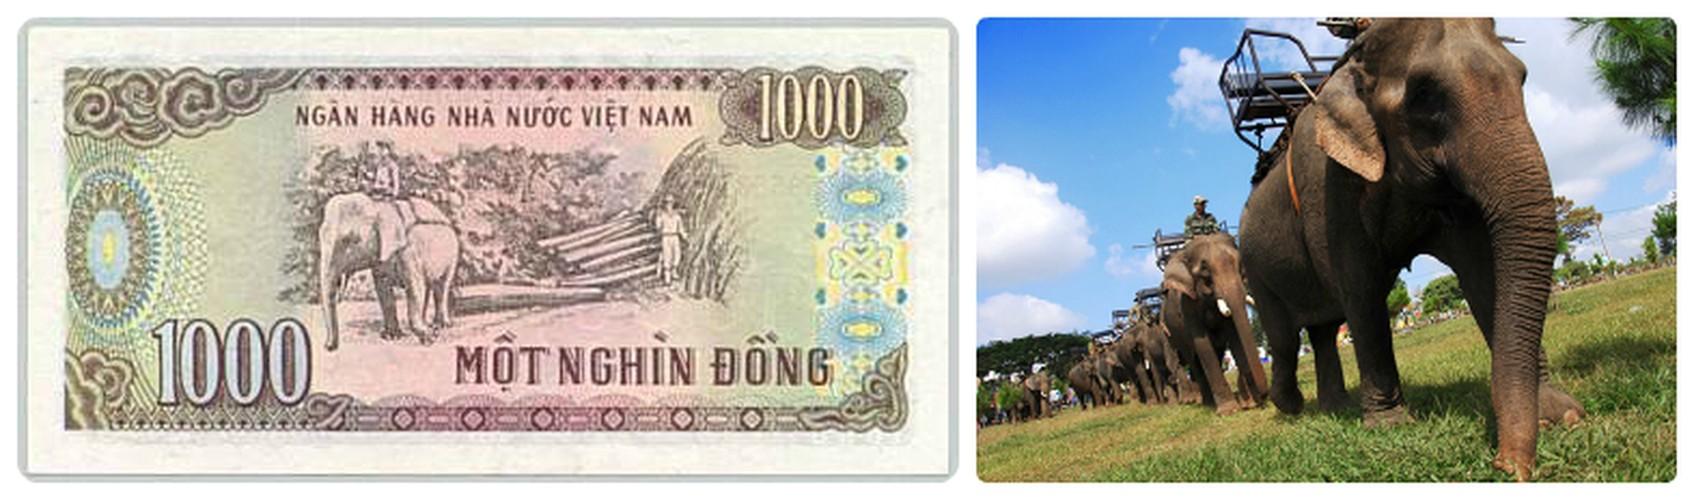 Giai ma tat tat dia danh in tren tien Viet Nam-Hinh-3